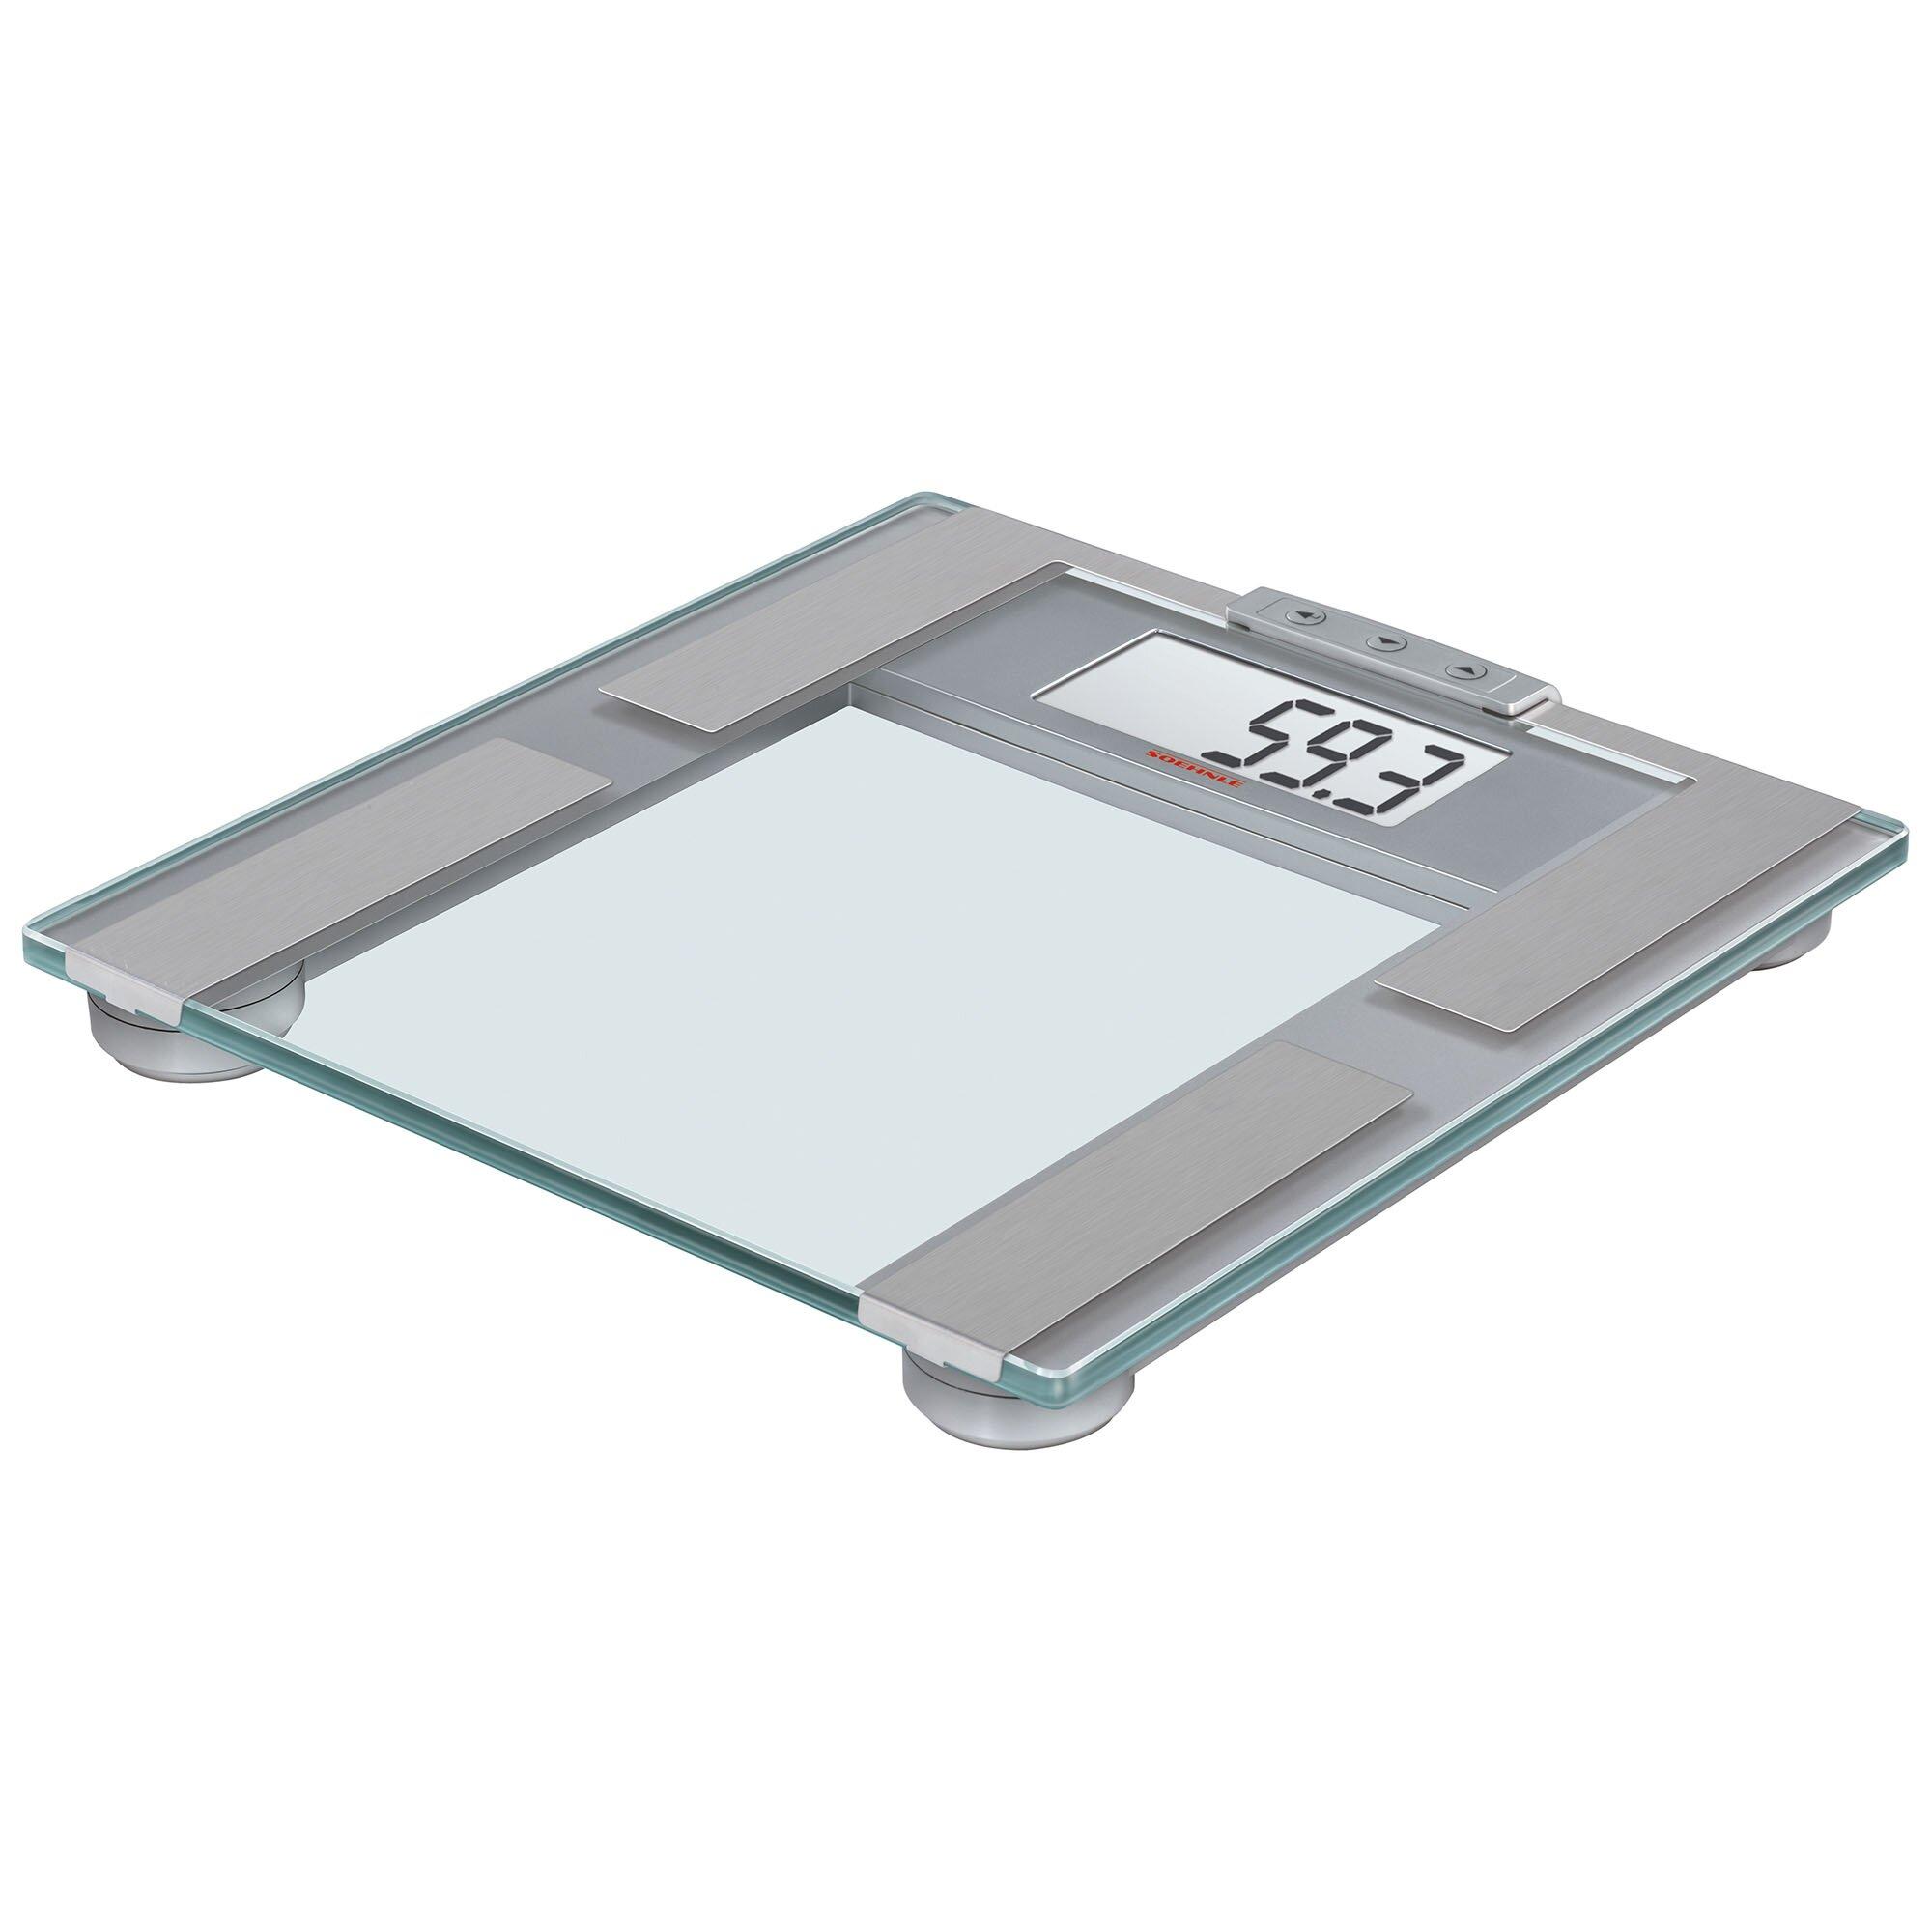 Bmi Bathroom Scale: Soehnle Body Balance Pharo 200 Precision BIA/BMI Digital